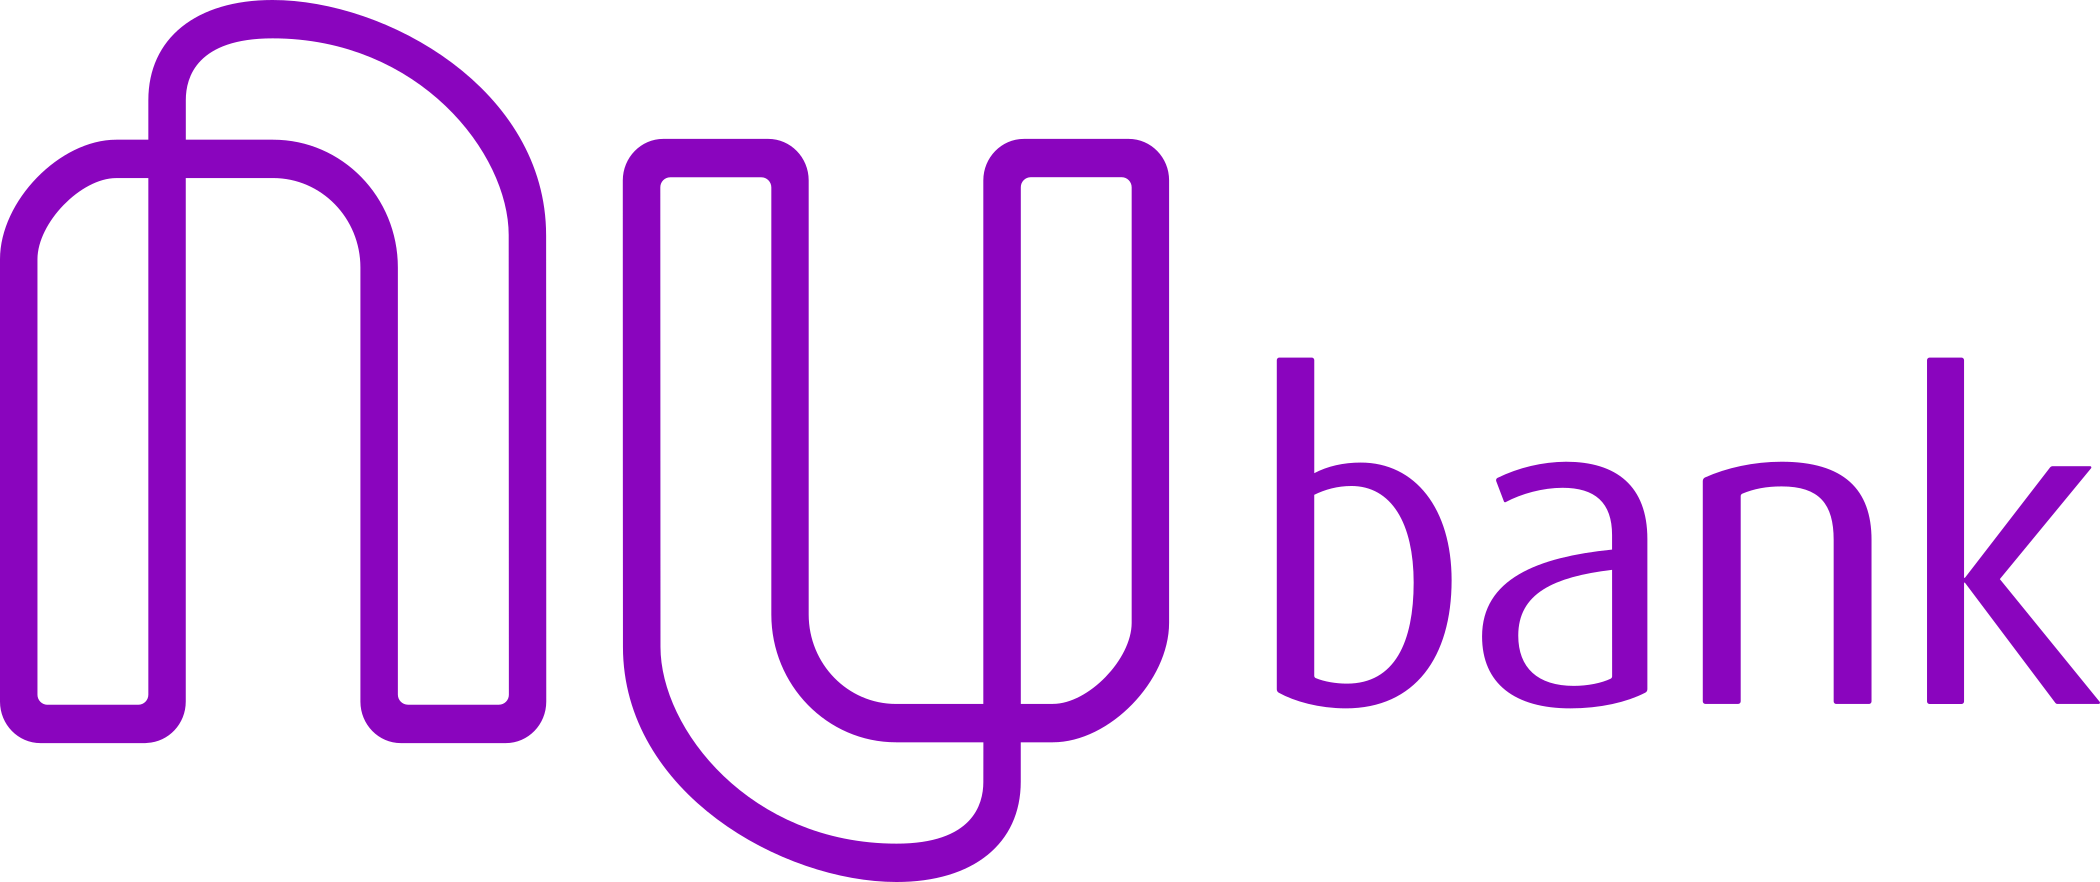 nubank logo 5 - Nubank Logo